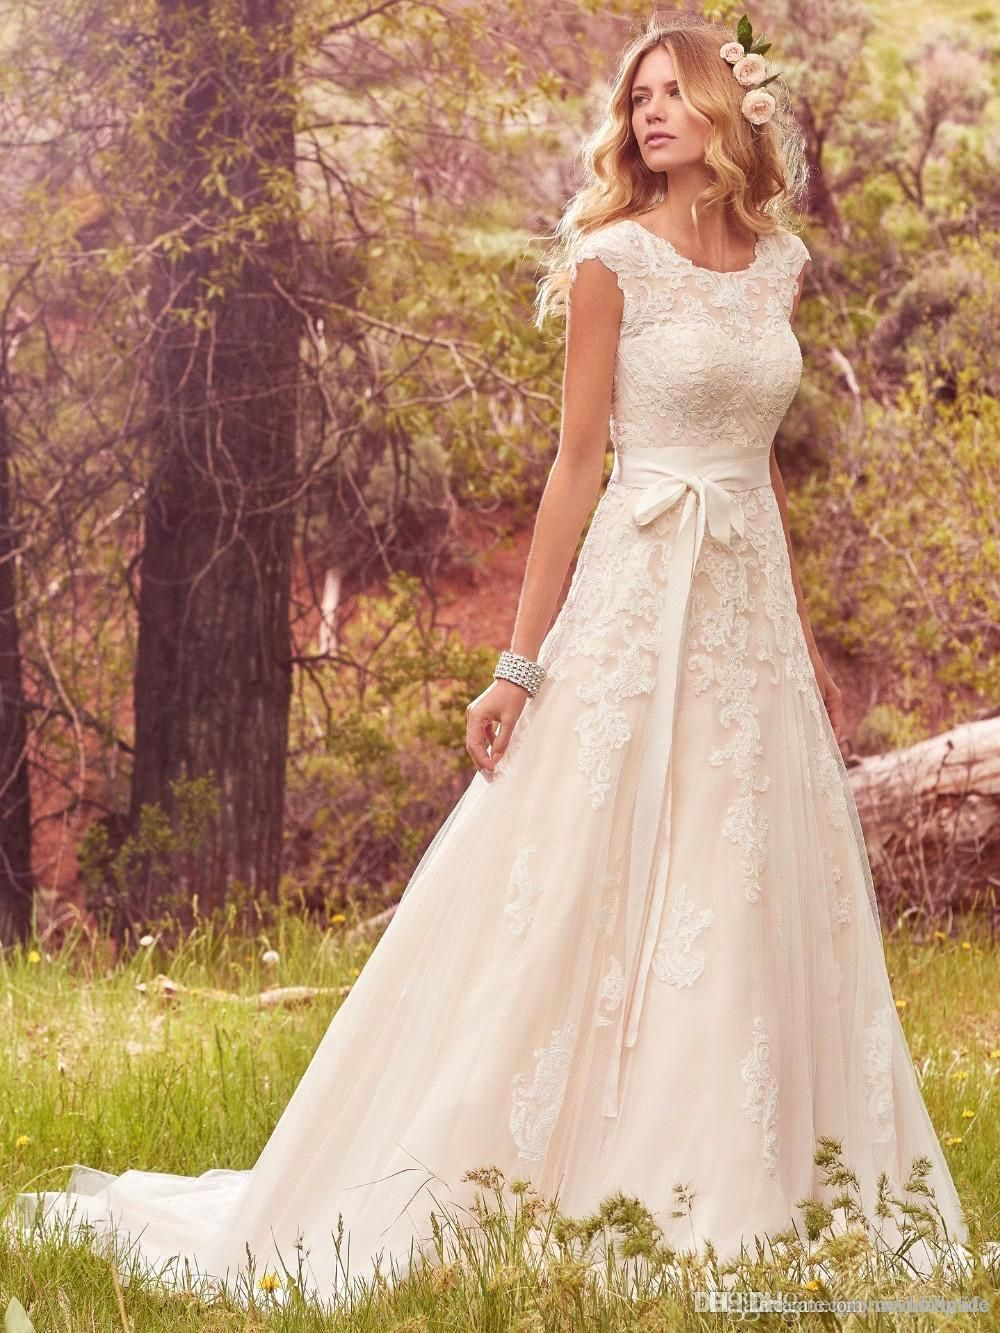 Discount 2017 Lace Bohemian Wedding Dresses Modest Cap Sleeves Jewel ...